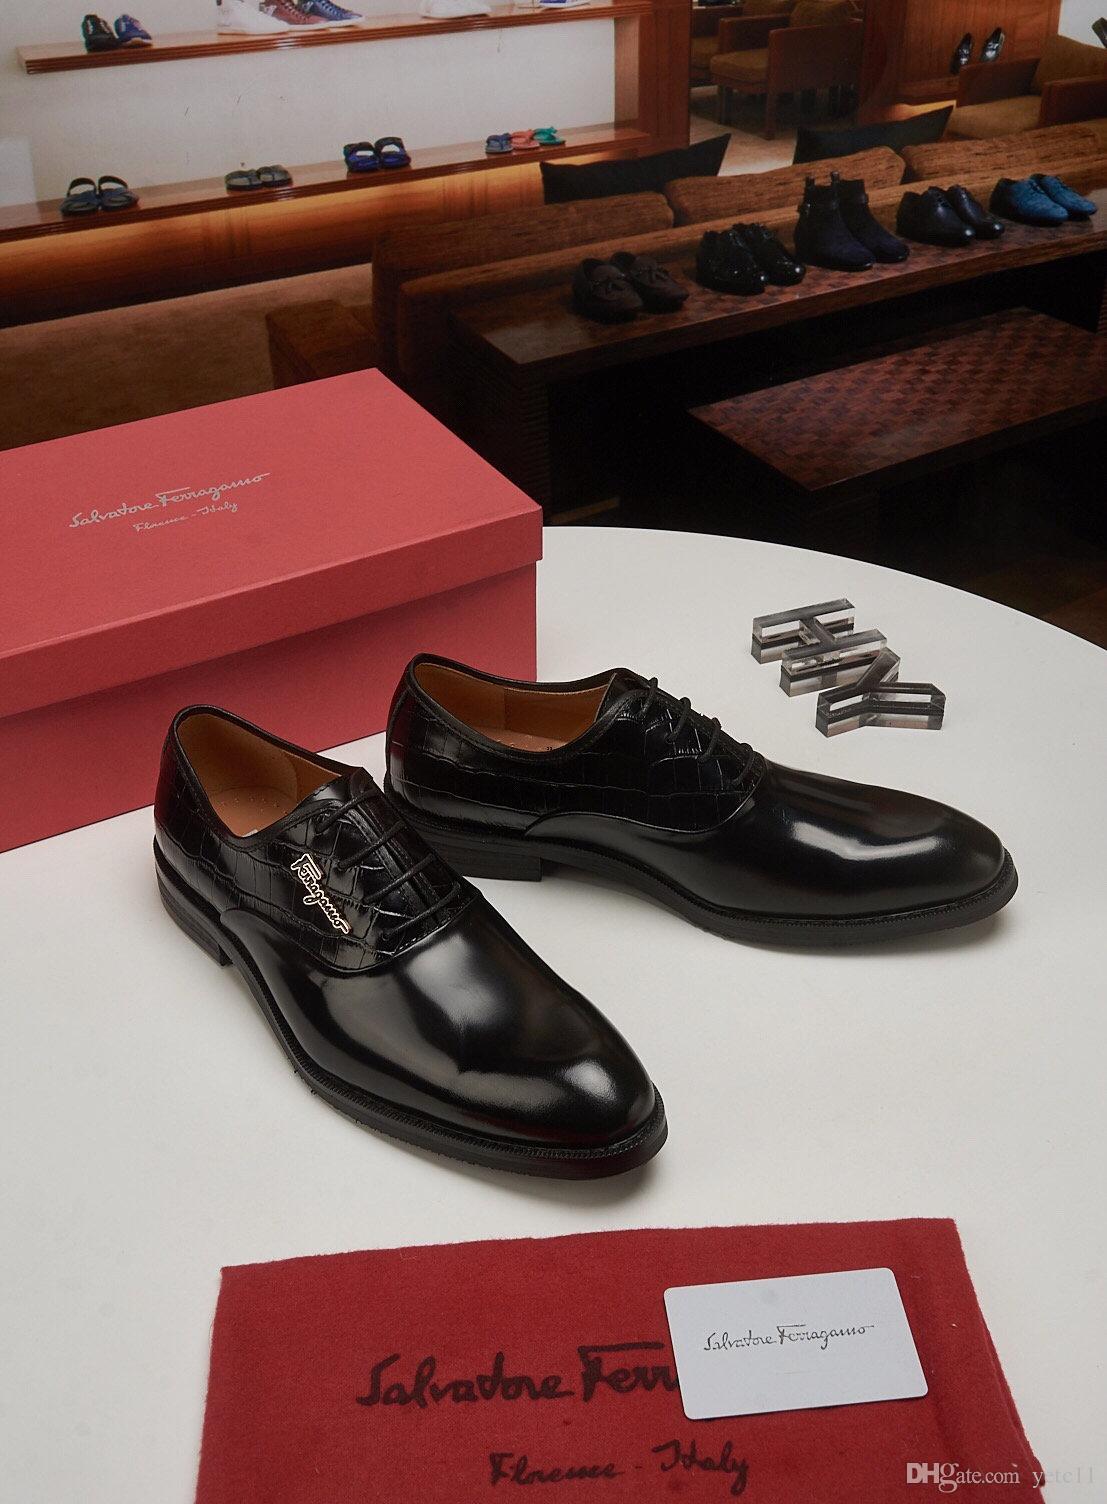 2019 Luxusmarken Männer Oxfords Schuh Hochzeit Brogue Crocodiles Muster Männer Kleid-Schuhe Leder formale Geschäfts-Schuhe